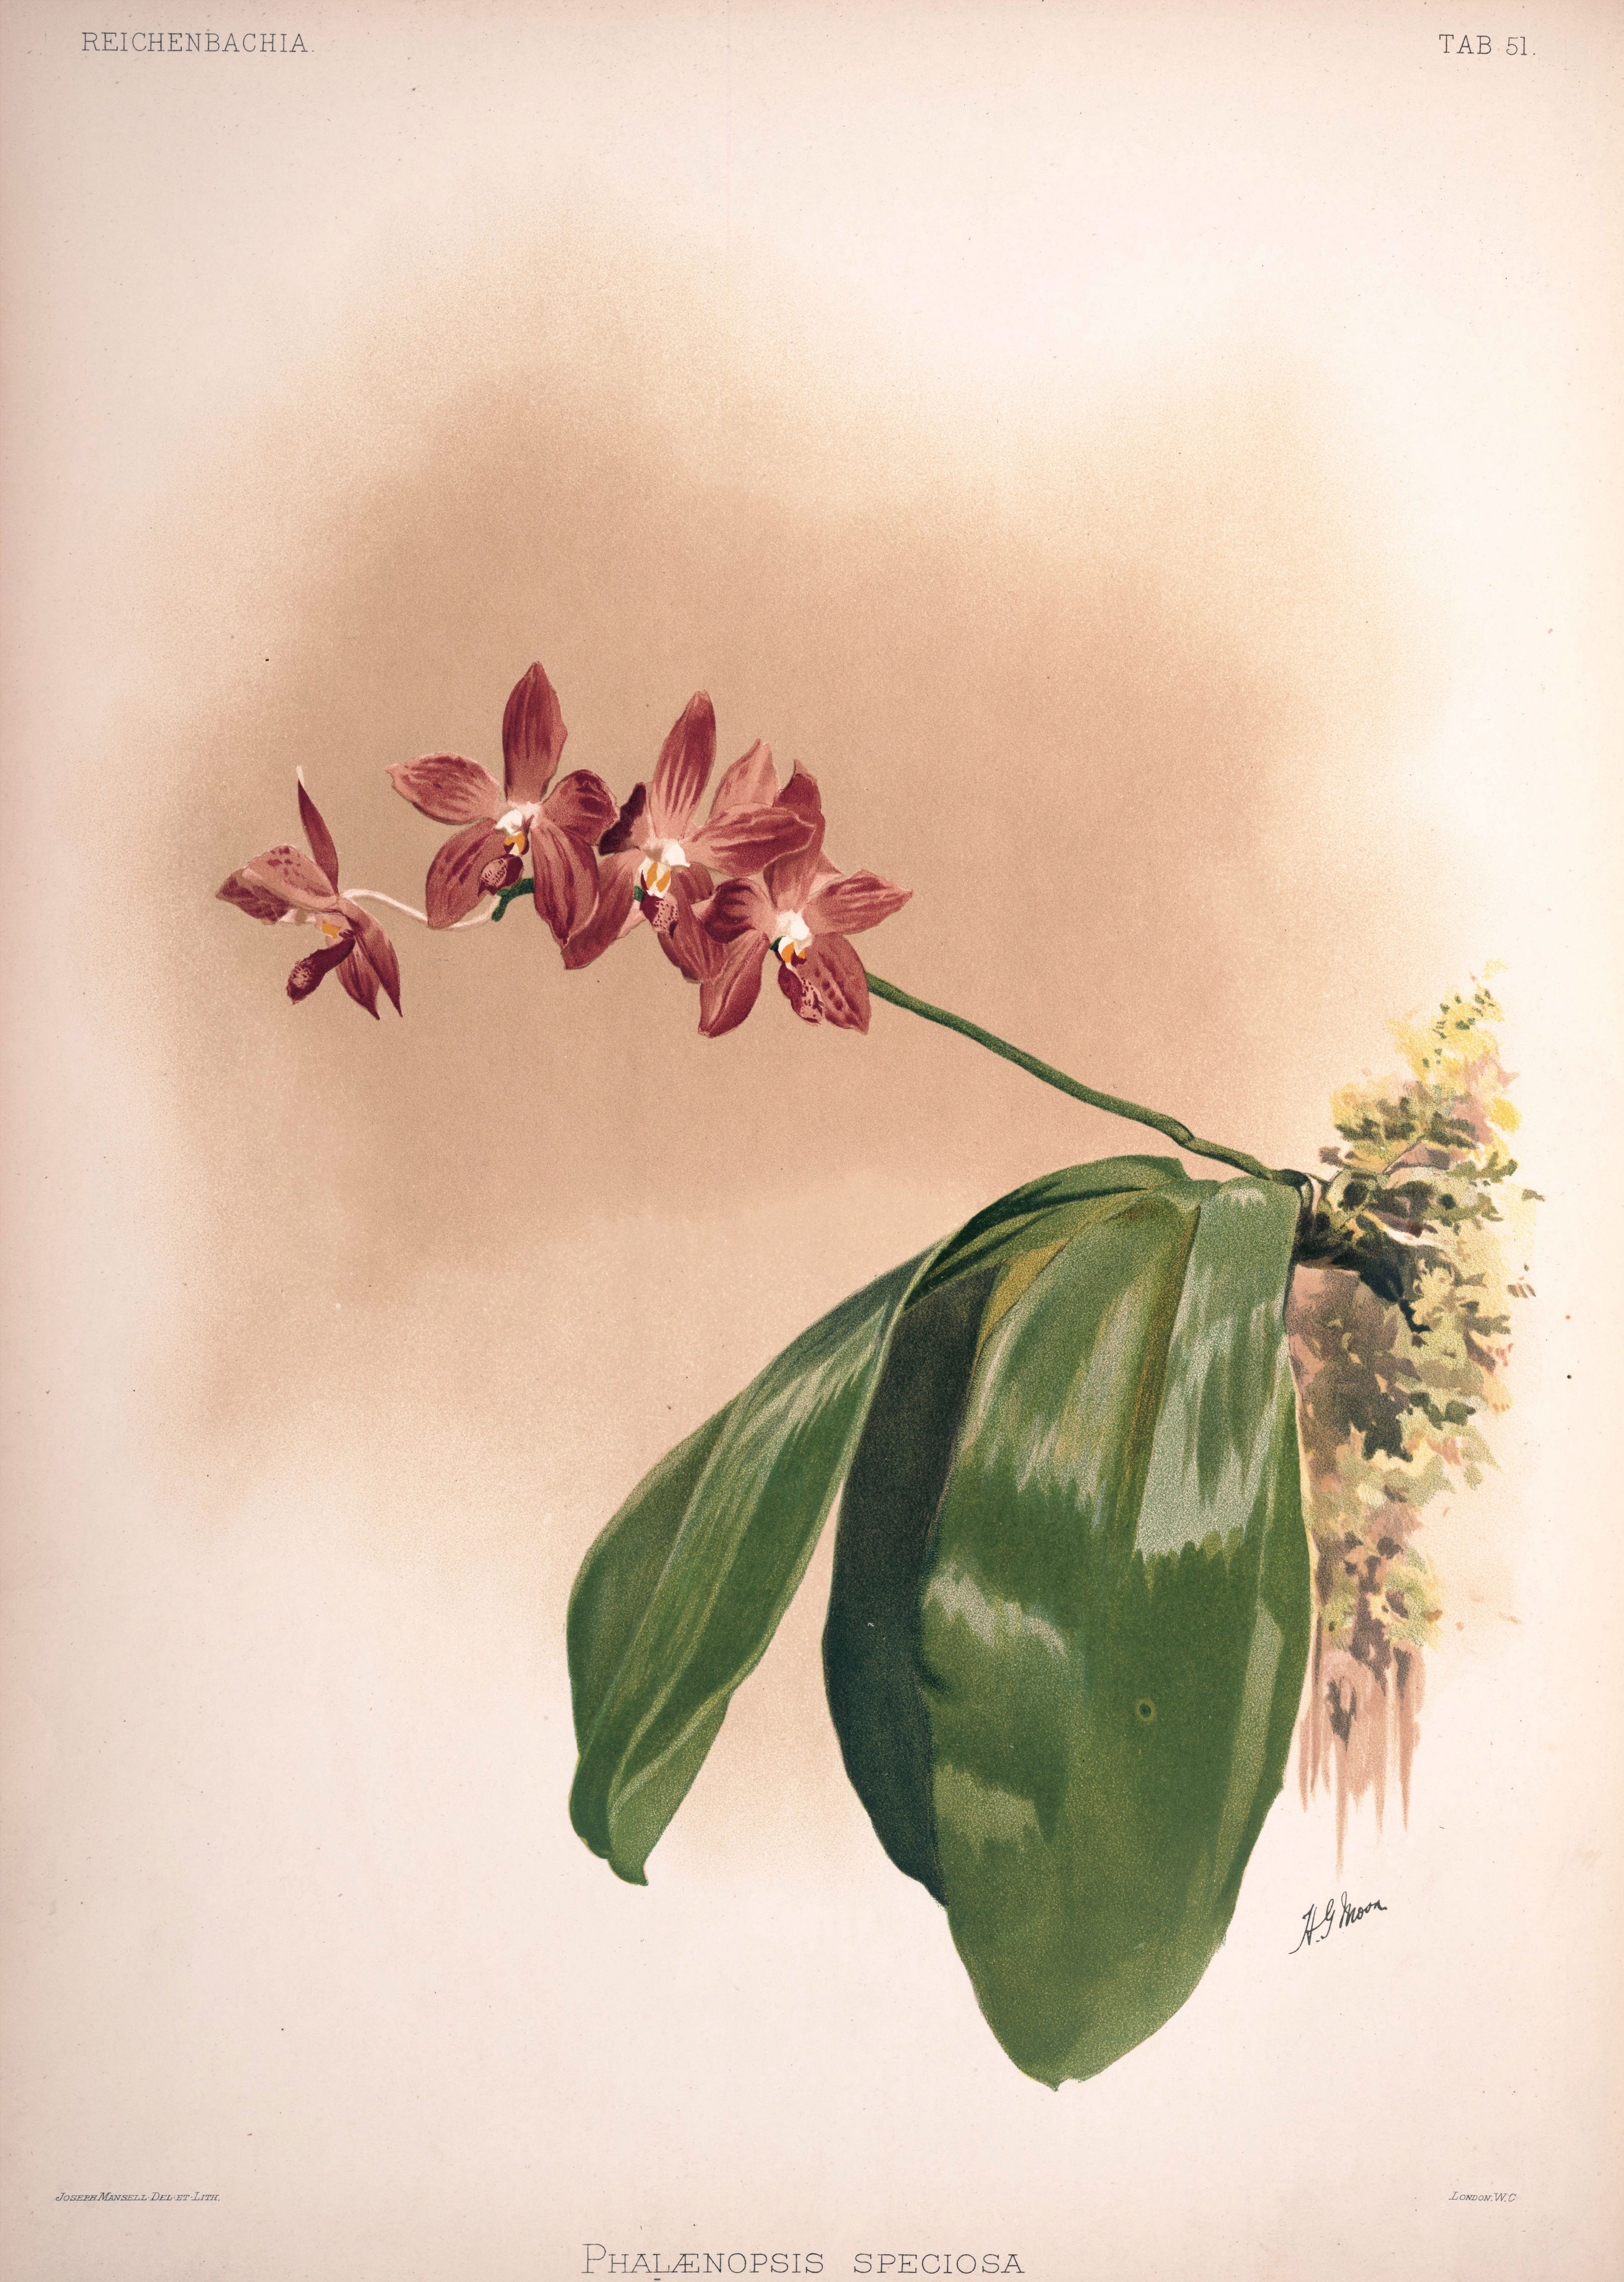 Discussion autour de Phalaenopsis tetraspis et speciosa Frederick_Sander_-_Reichenbachia_II_plate_51_%281890%29_-_Phalaenopsis_speciosa